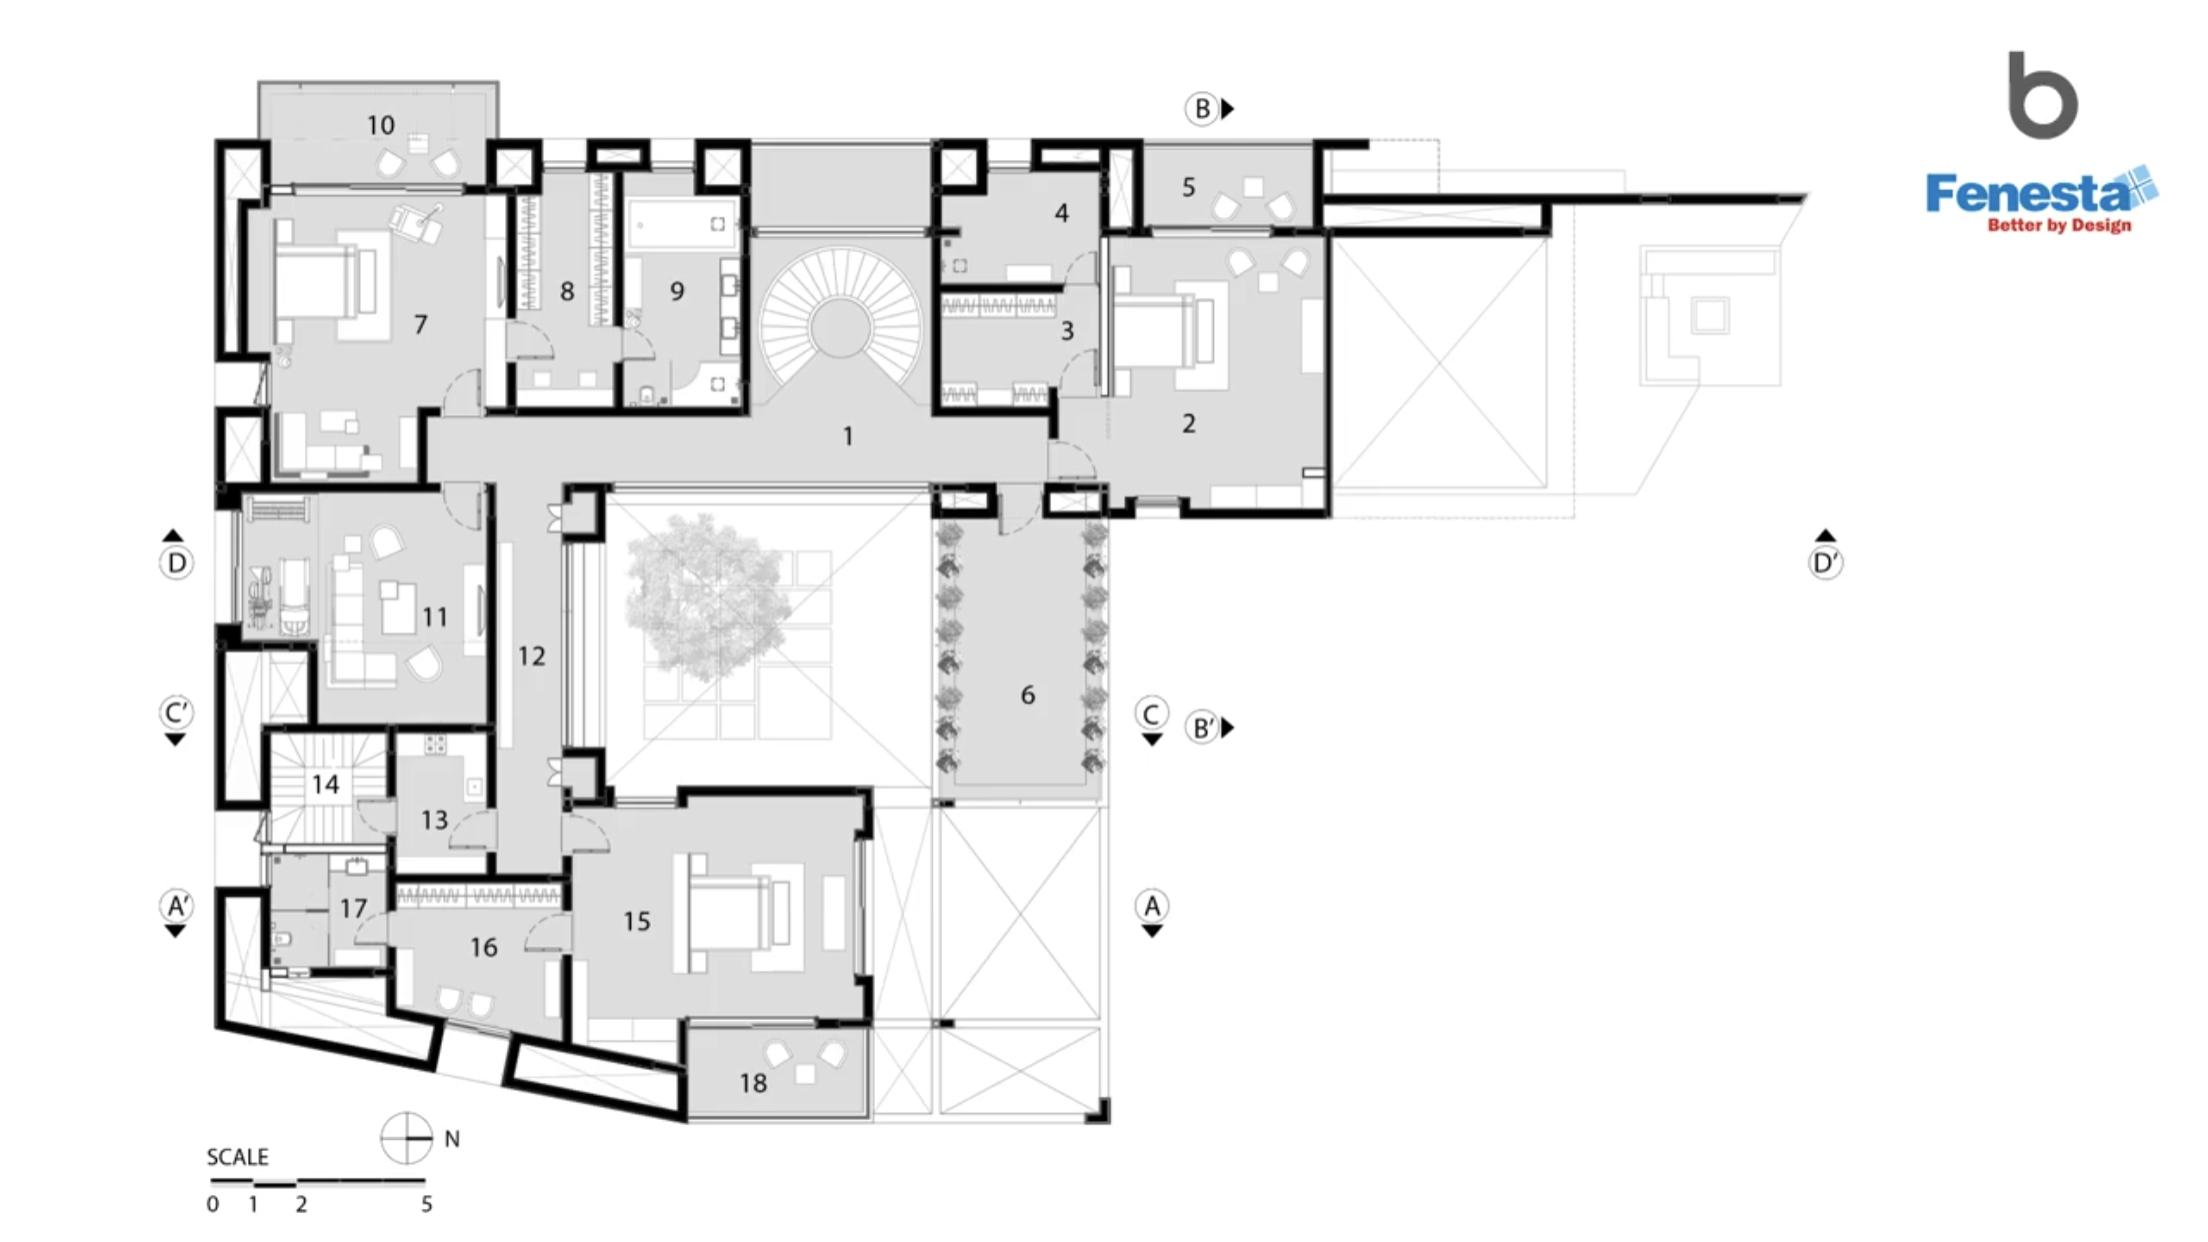 Buildofy Https Youtu Be Oxu4xfx2ega Architecture Plan Floor Plans Courtyard House